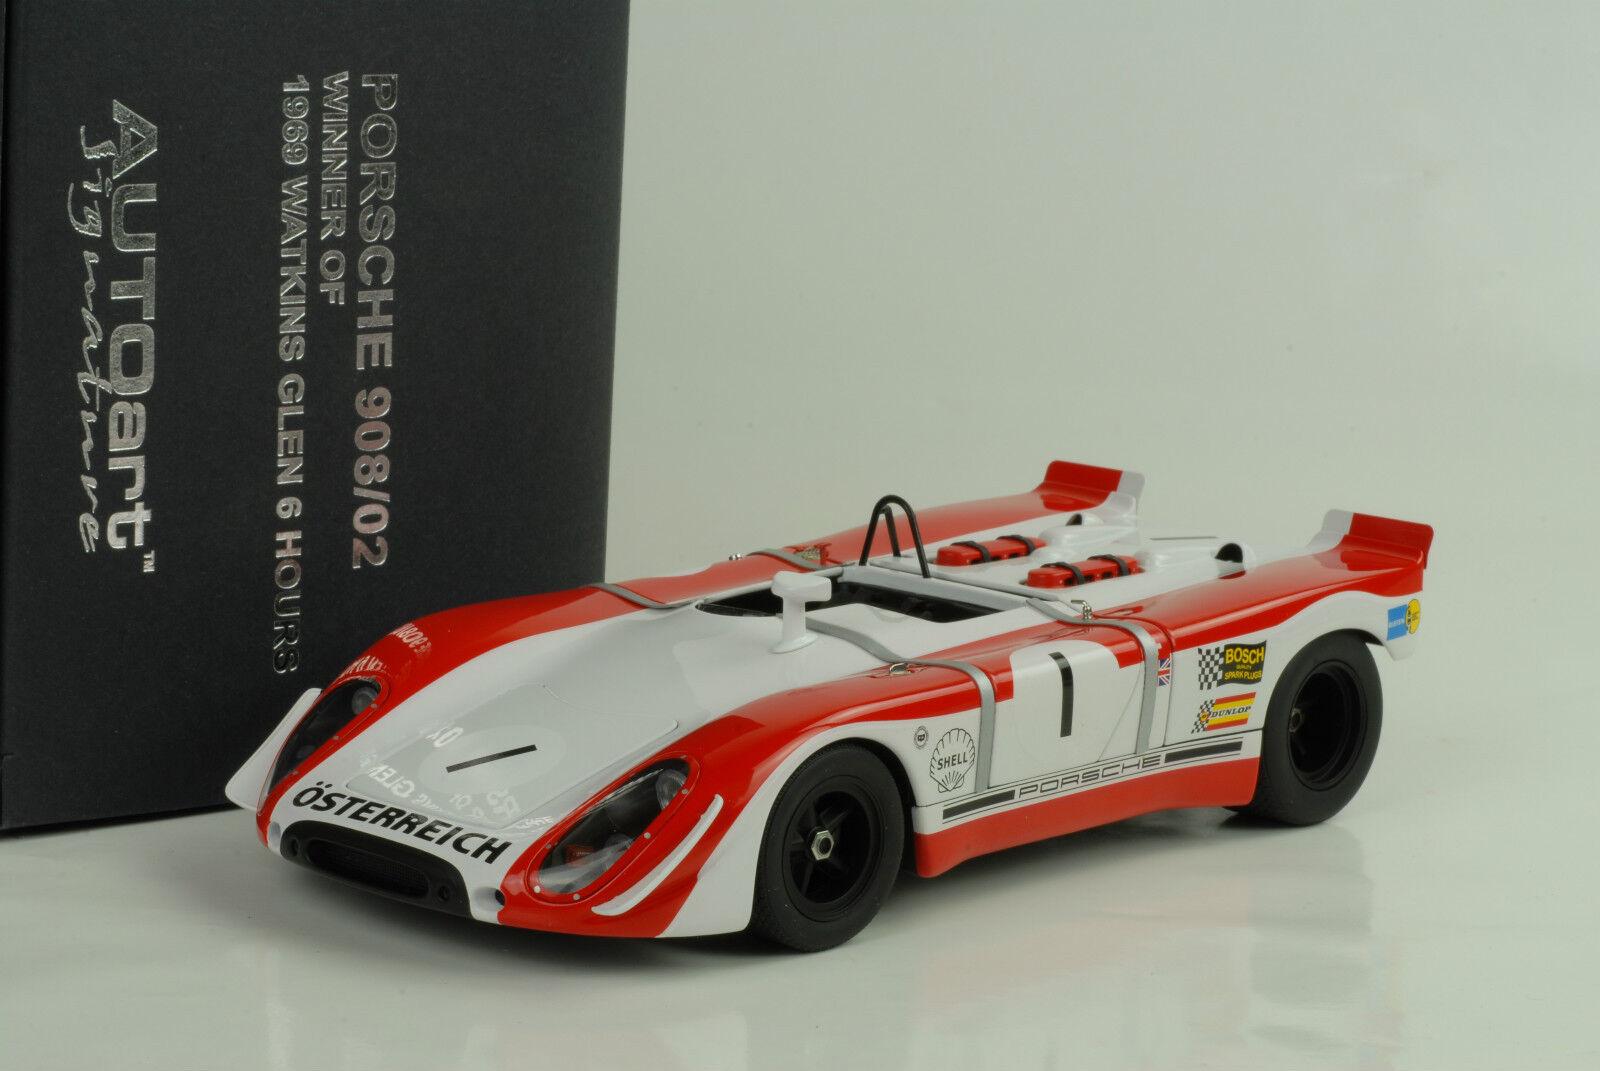 1969 Porsche 908  2 Watkins Glen 6Hours rödman  Siffert 1 18 bilkonst